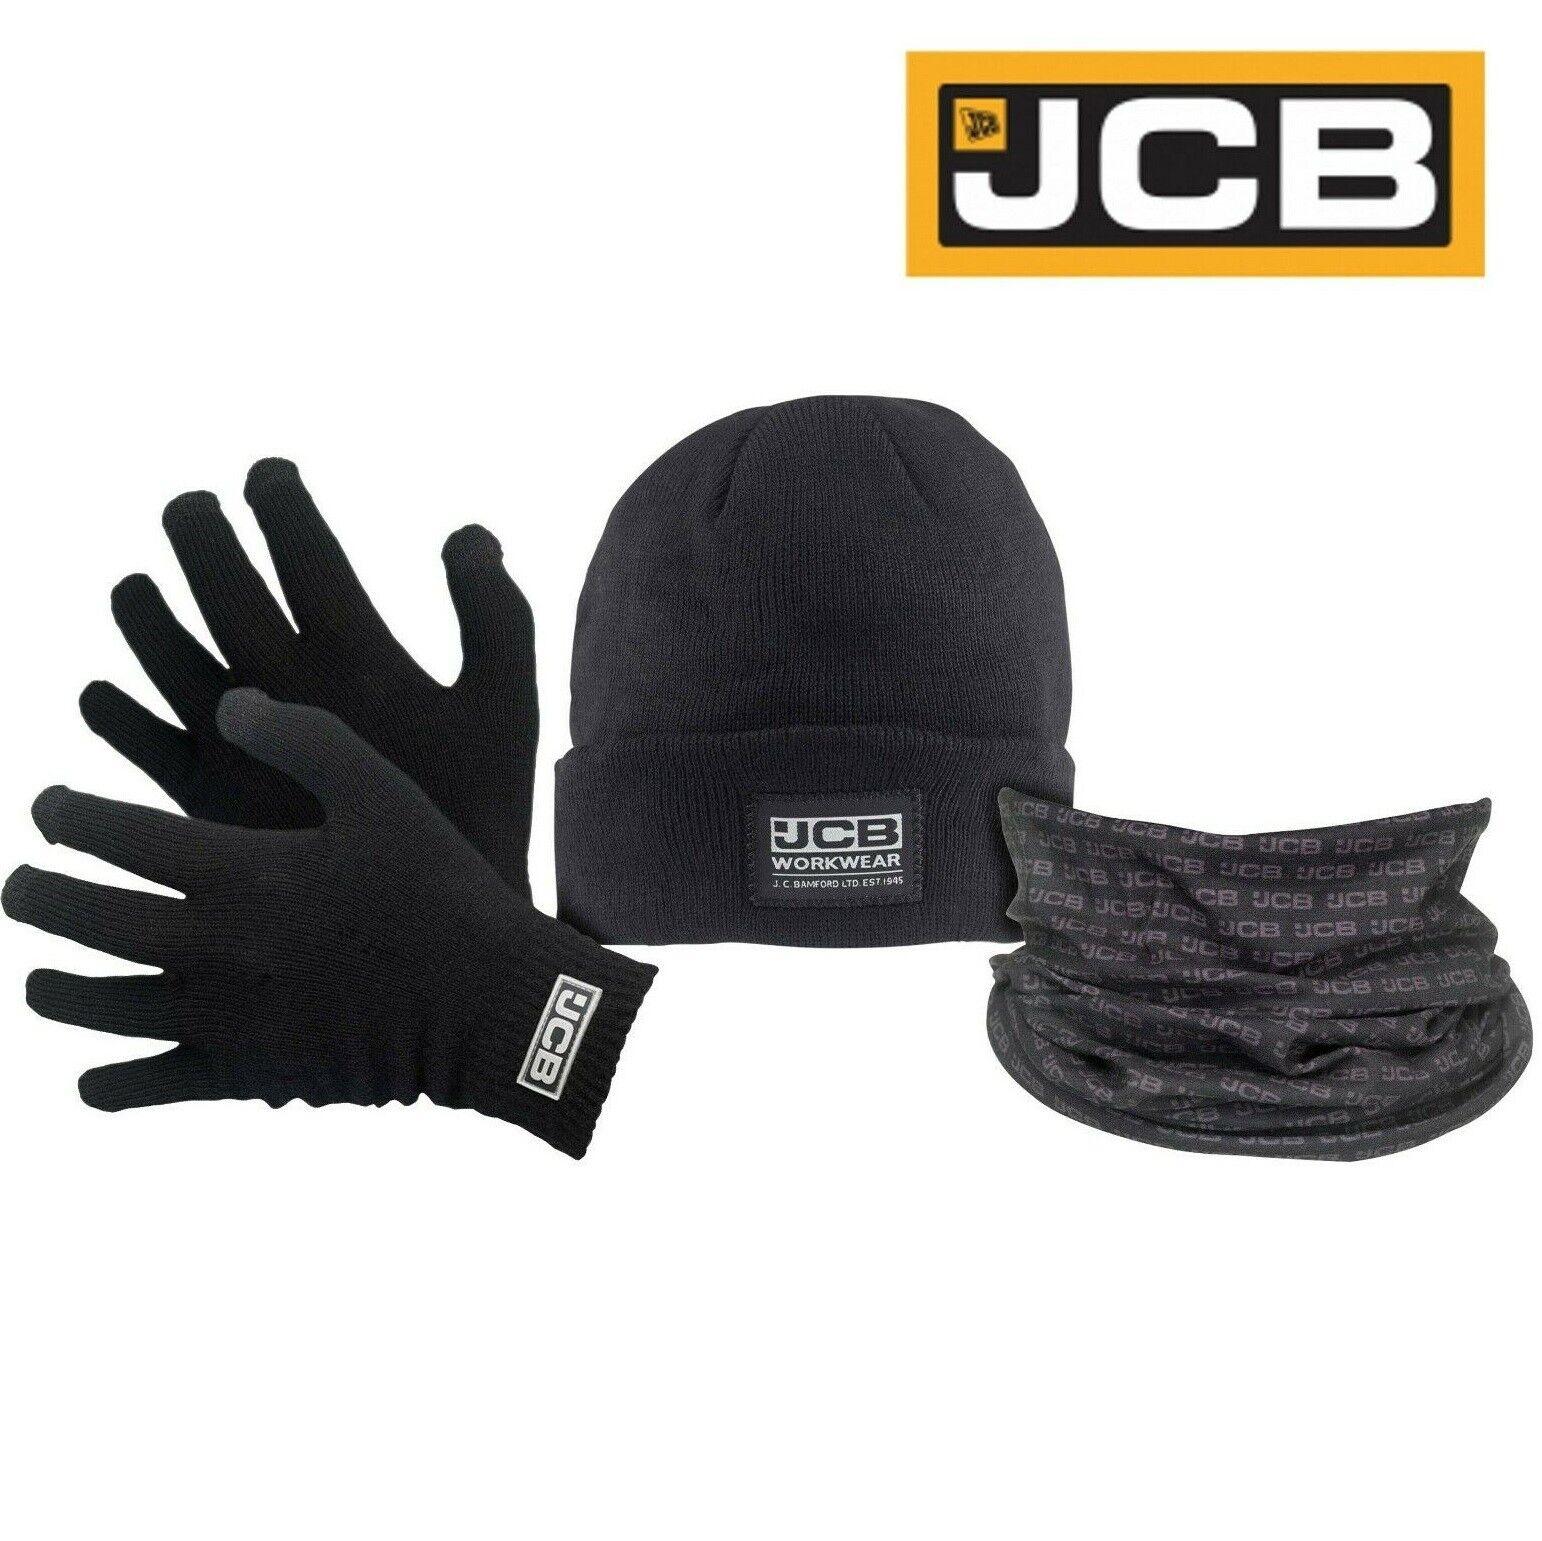 JCB Winter Set Touch Screen Gloves Beanie Hat & Snood - JCB Workwear One Size UK